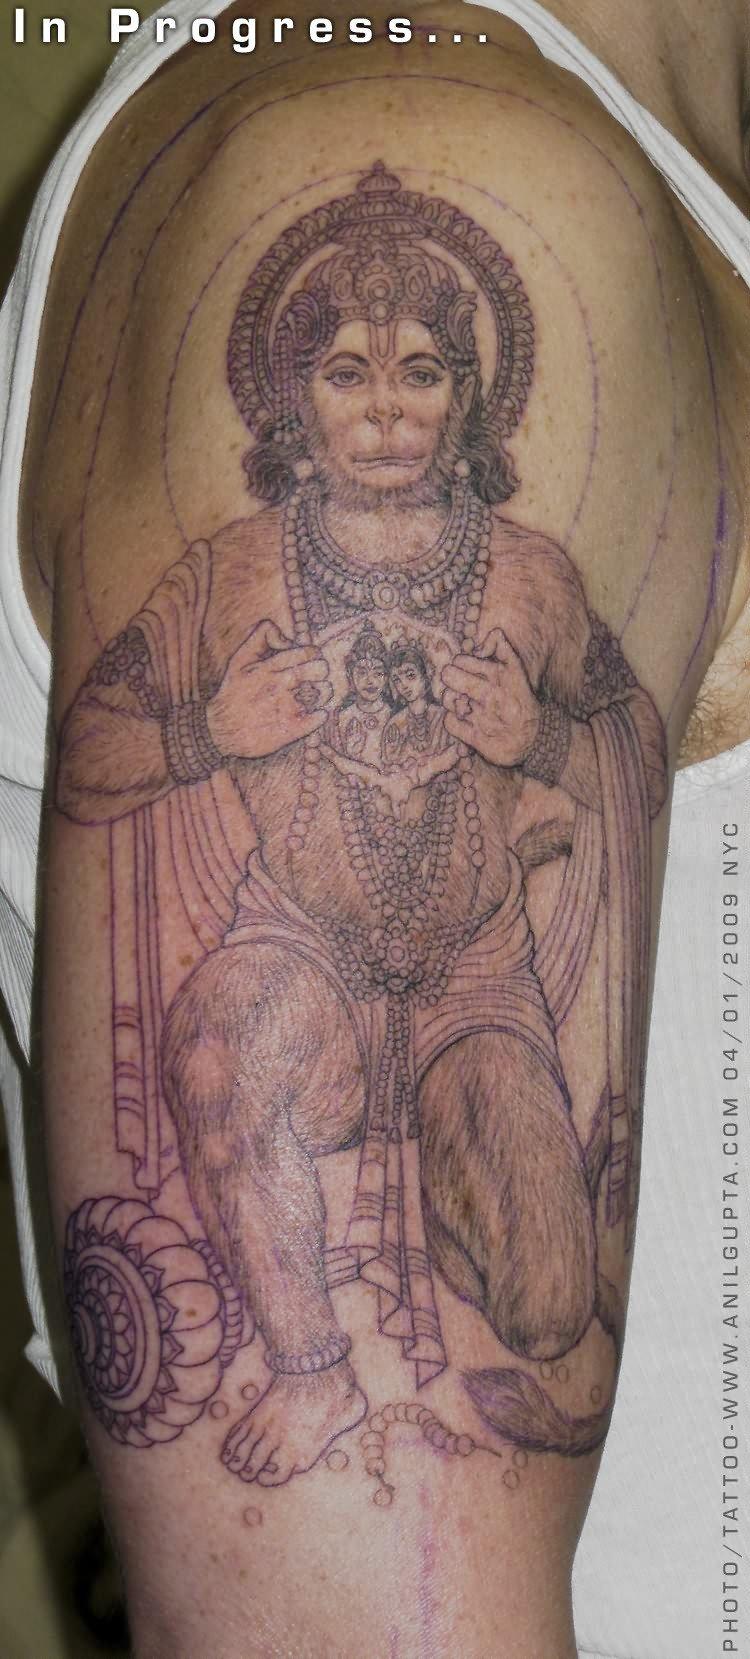 Hanuman Monkey Tattoo On Bicep